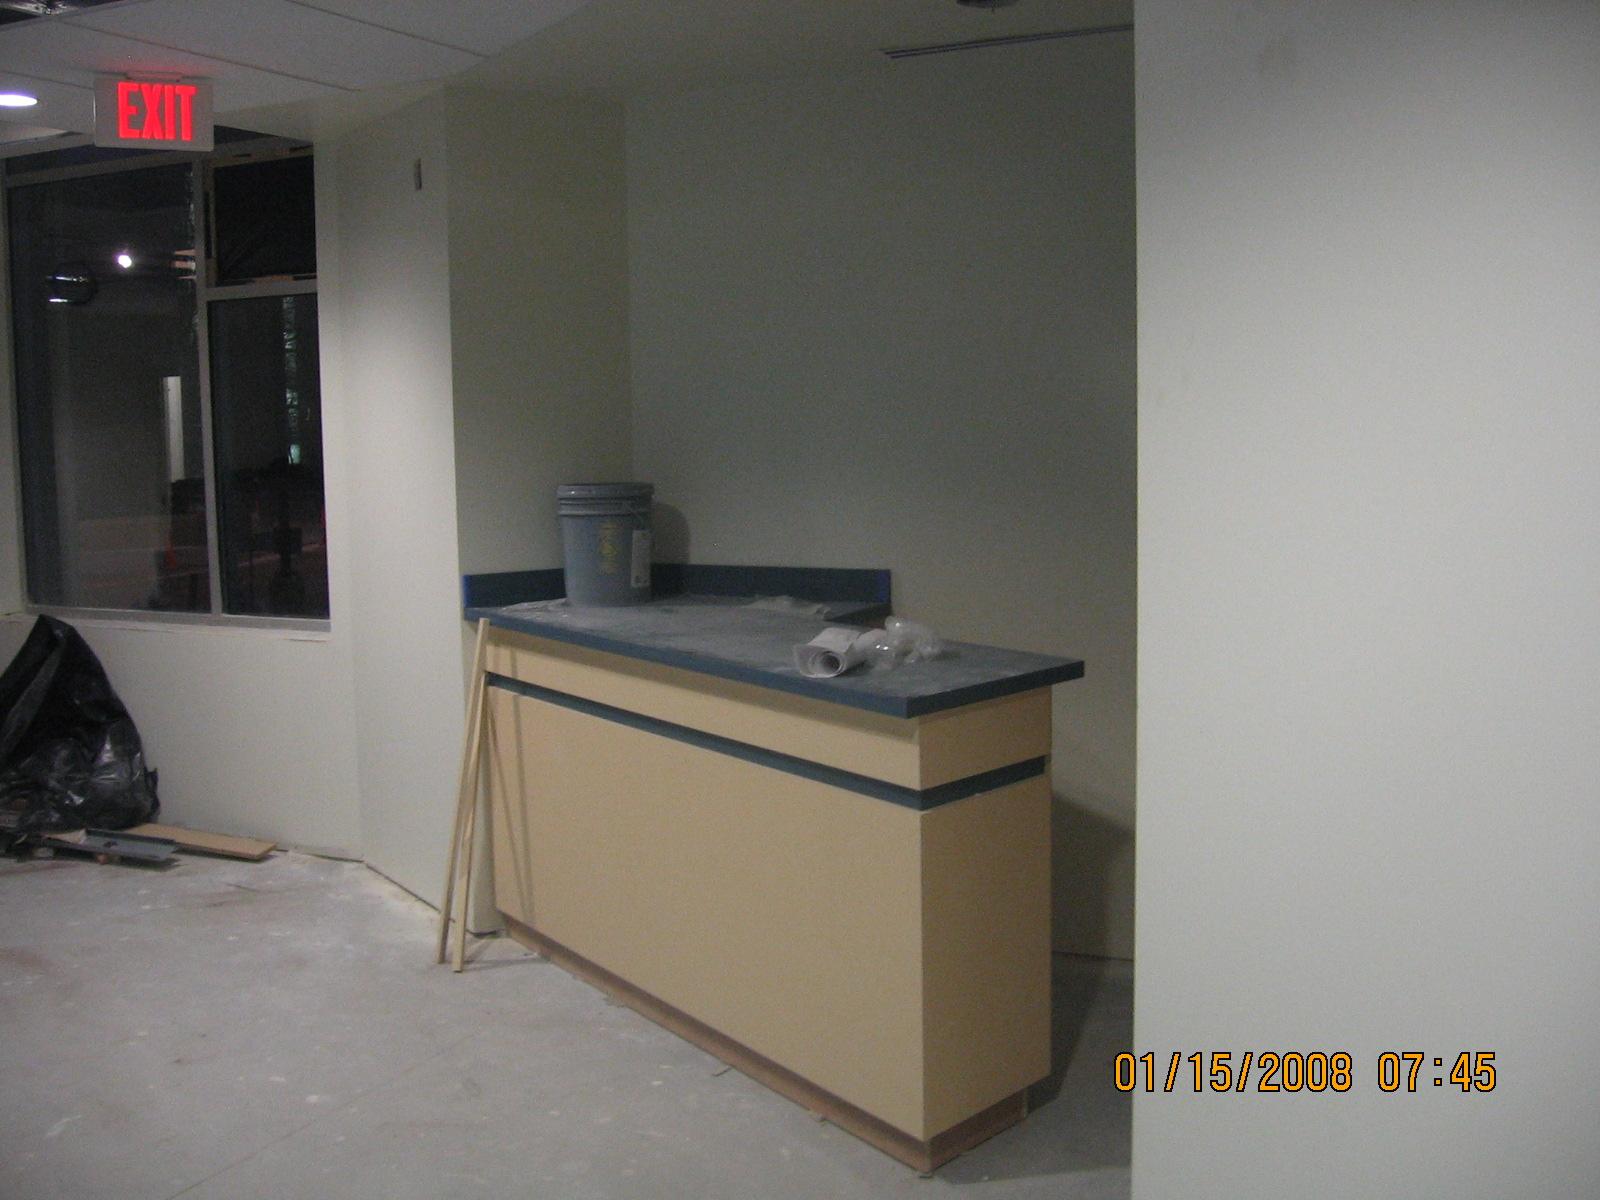 2008, January 18